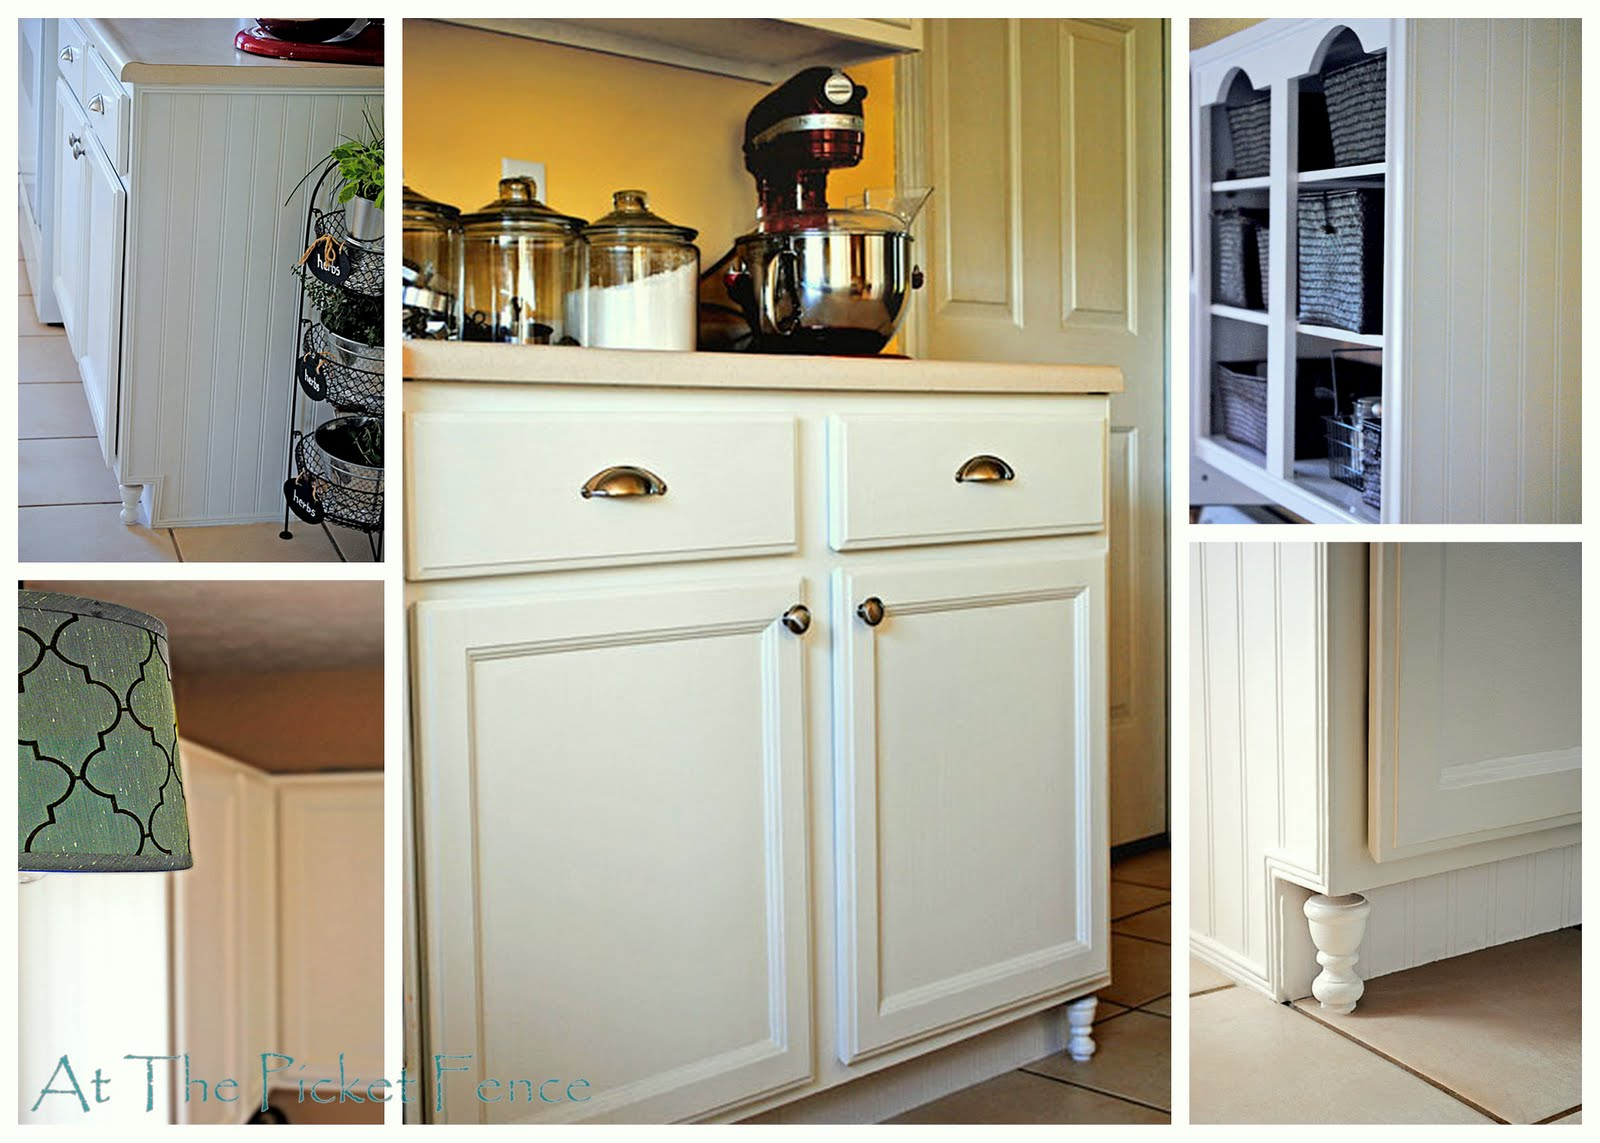 Make Your Own Frugal Kitchen Cabinet Feet